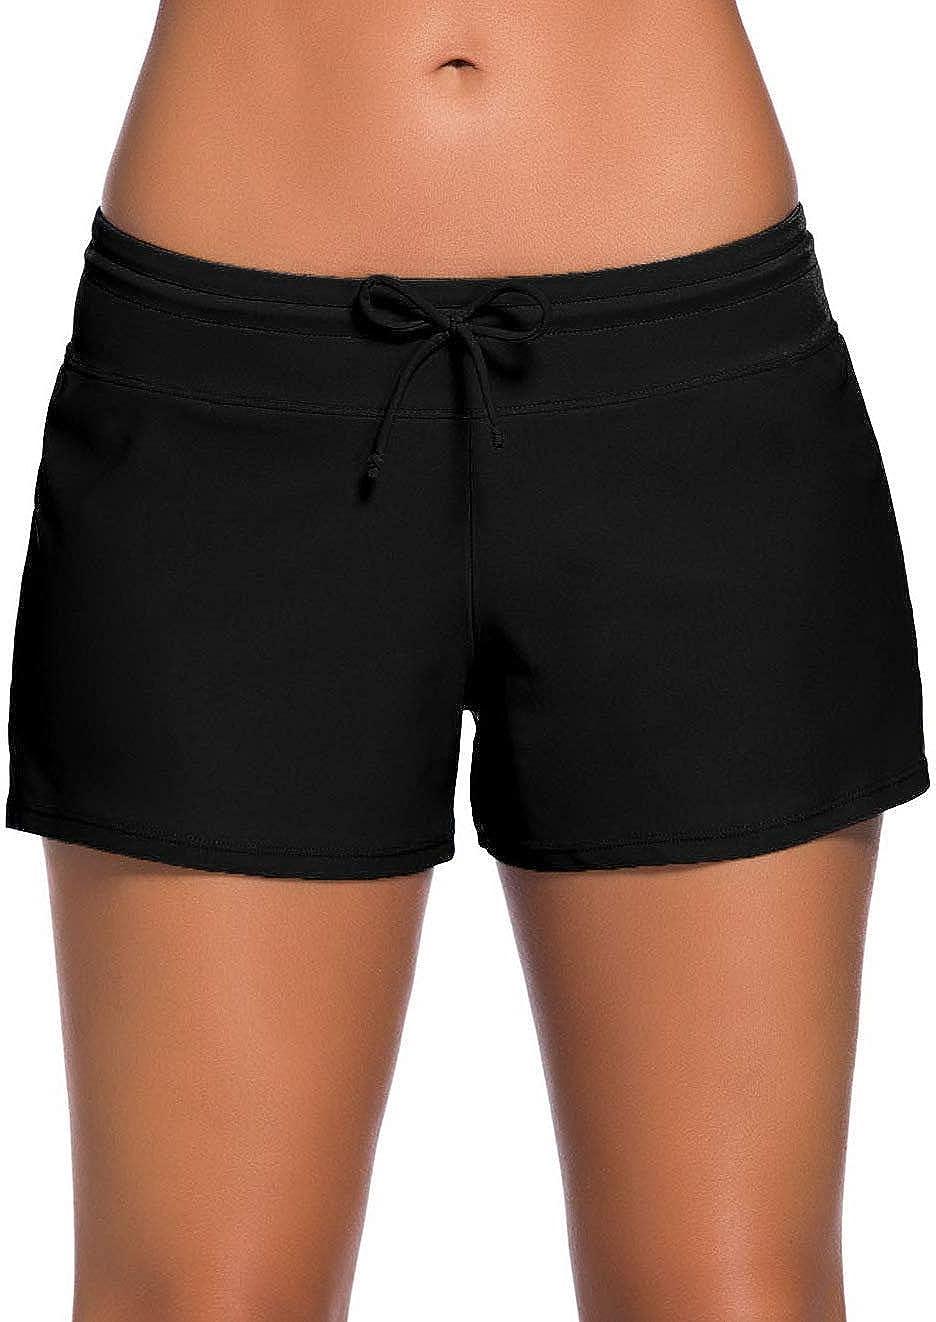 ChinFun Board Shorts Women's Swimswear Tankini Swim Briefs Swimsuit Bottom Boardshorts Beach Trunks